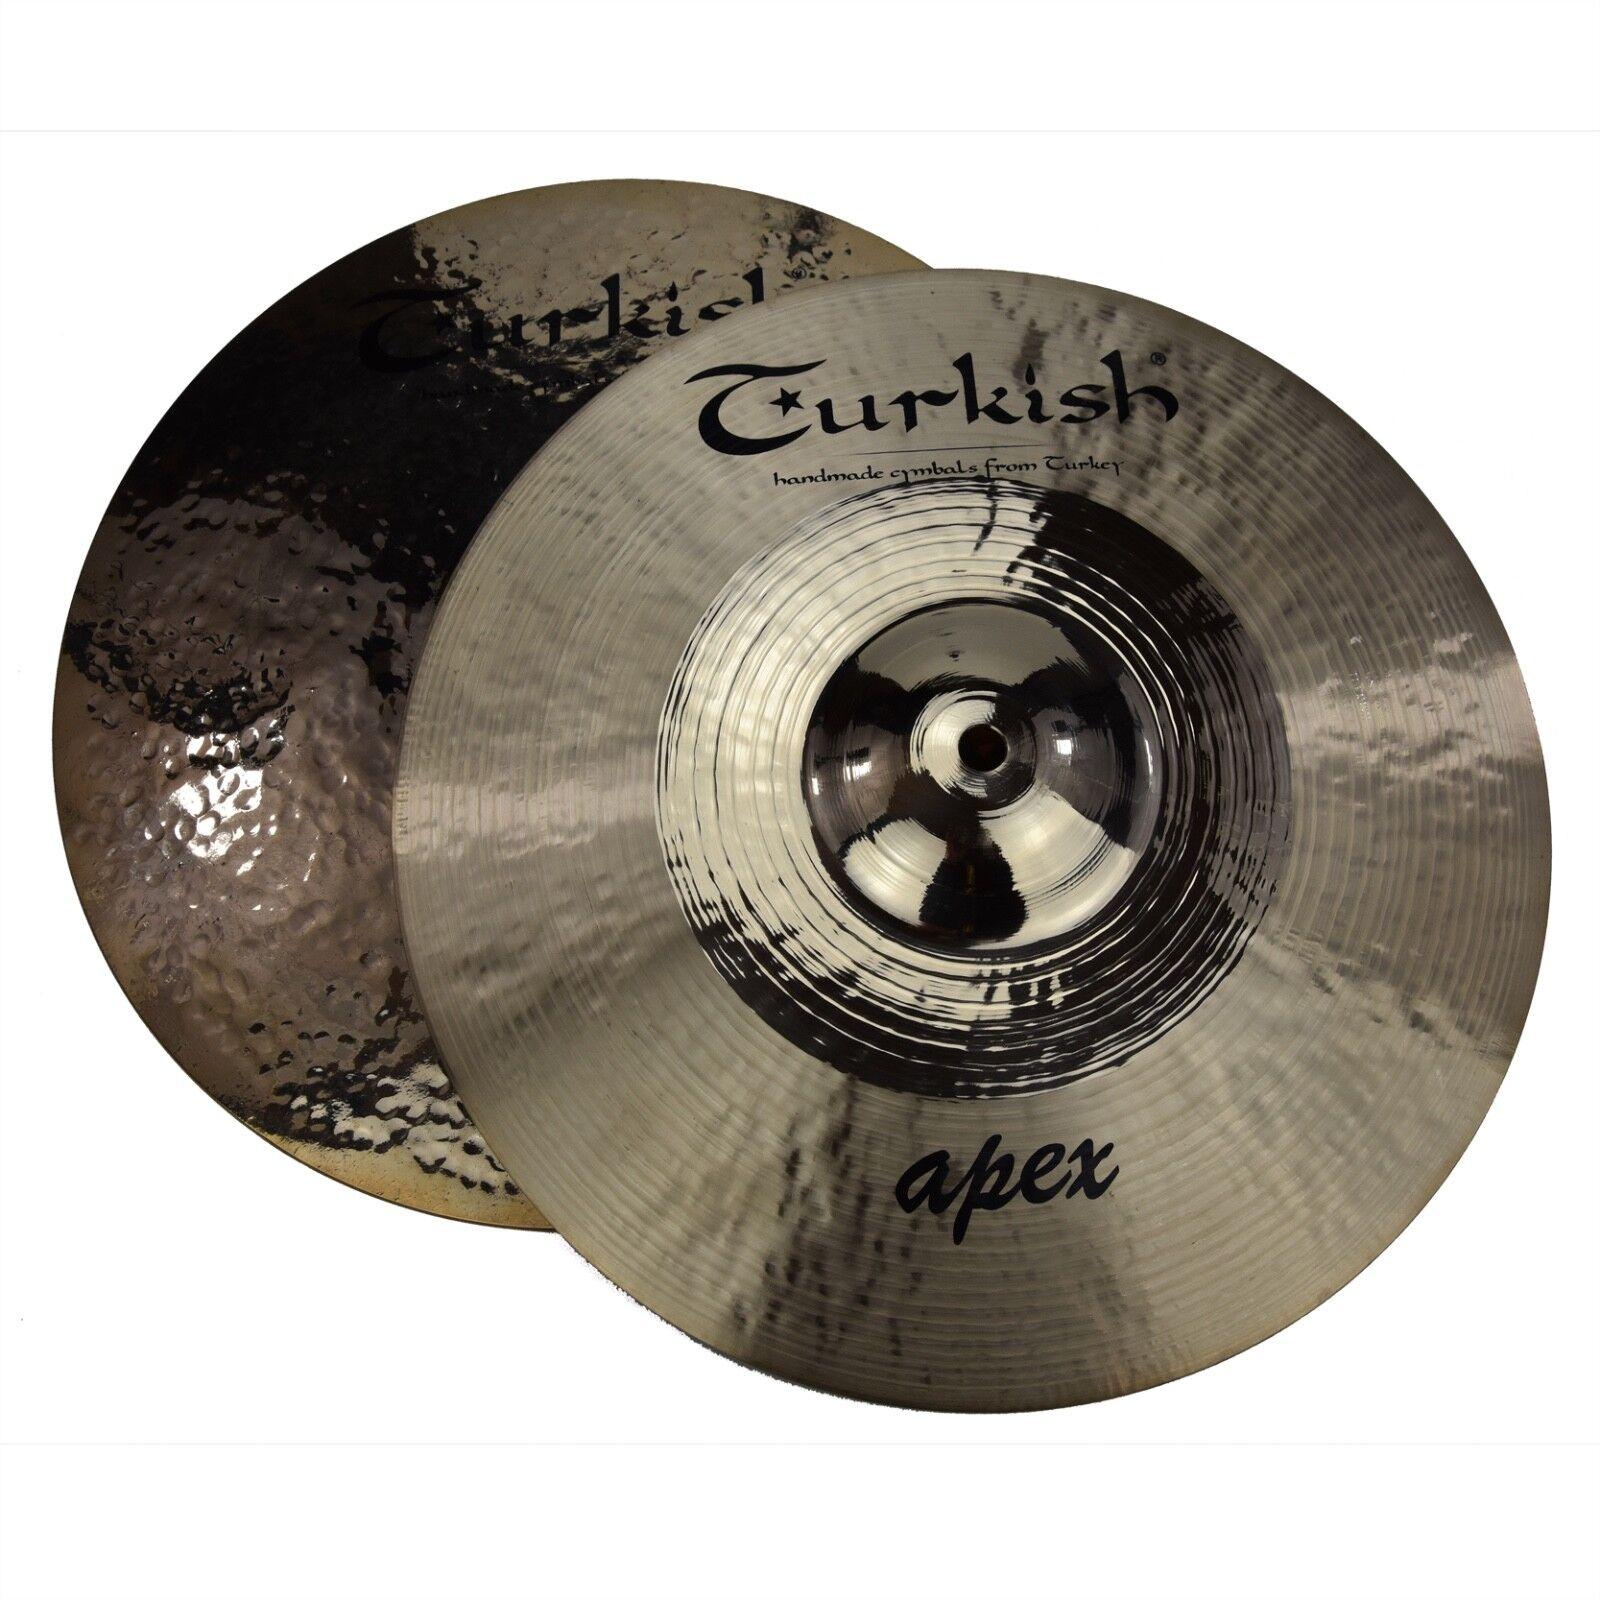 TURKISH CYMBALS Becken 14  HiHat Apex Rock bekken cymbale cymbal 1274 1495g